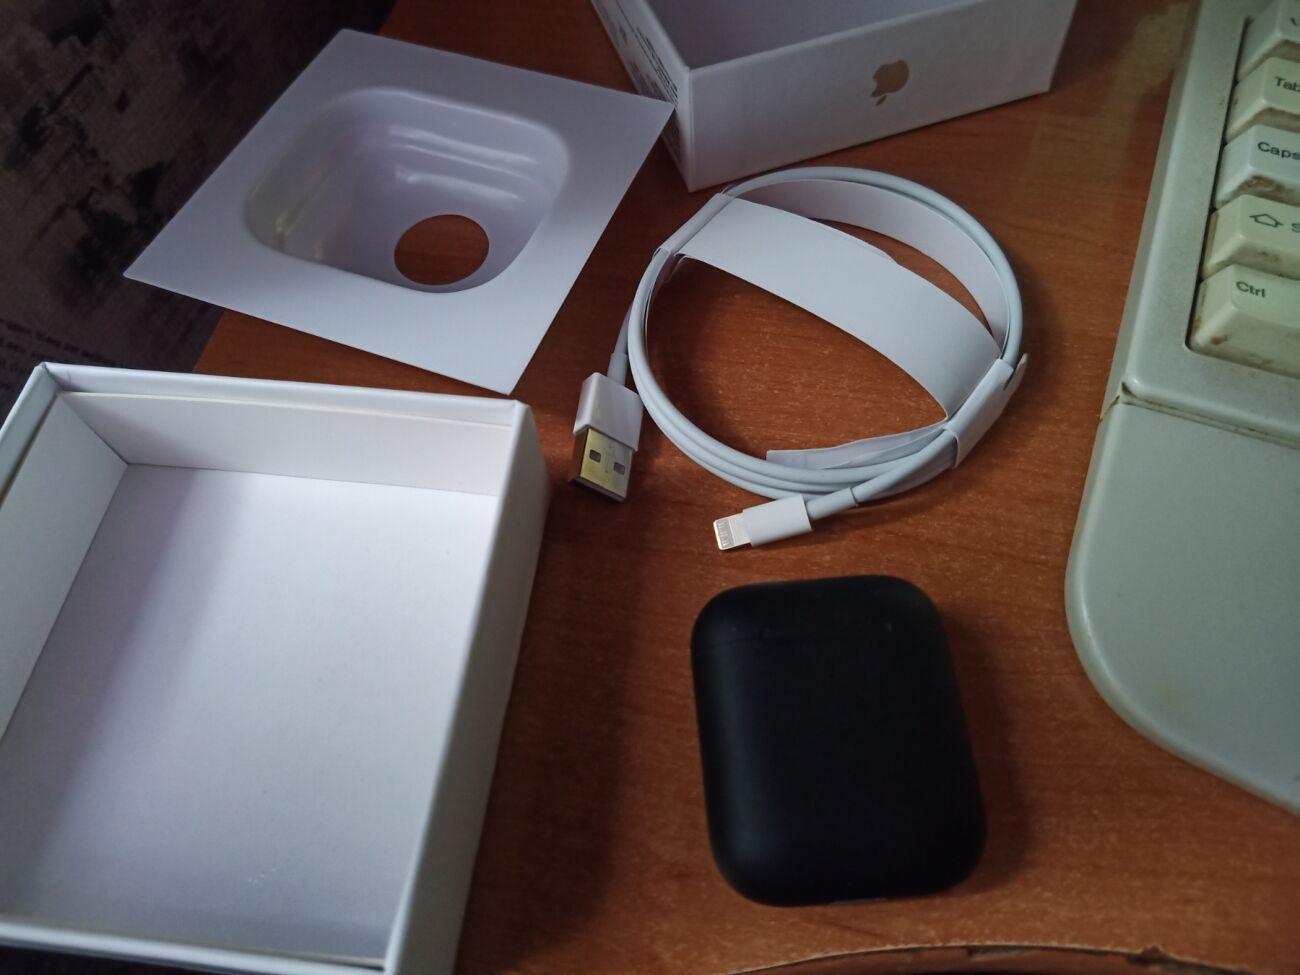 Airpods 2 Apple Airpods 2 Аирподс. Беспроводные наушники 1;1 Оригинал